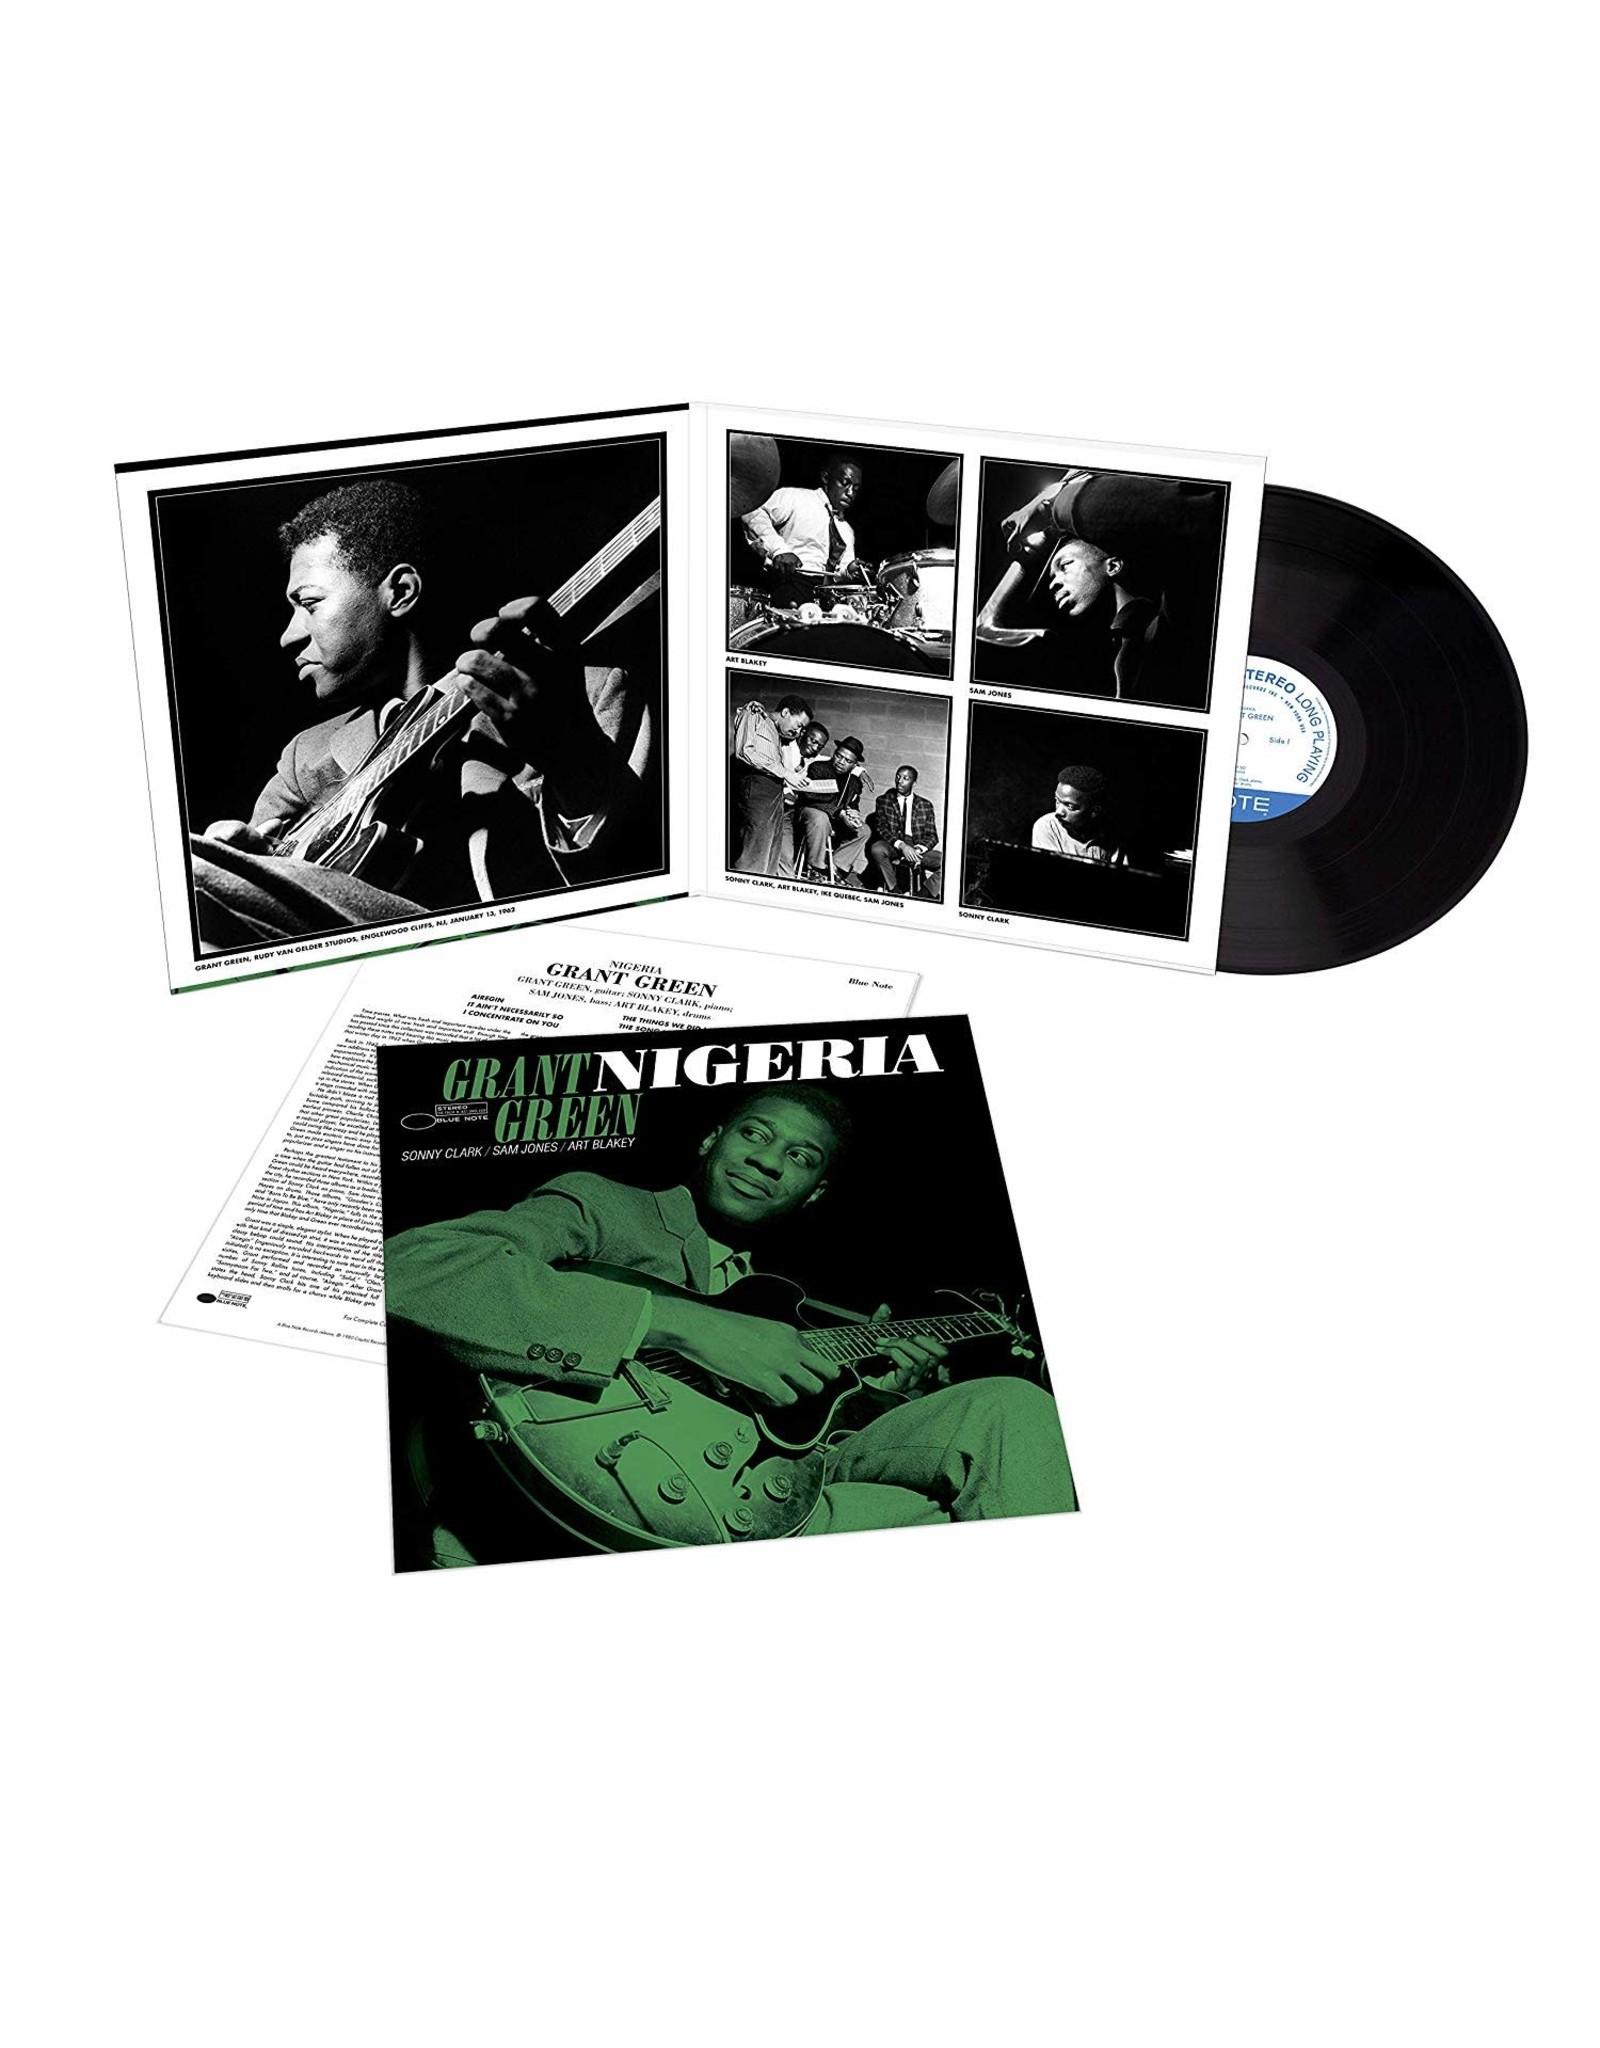 Grant Green - Nigeria (Blue Note Tone Poet)